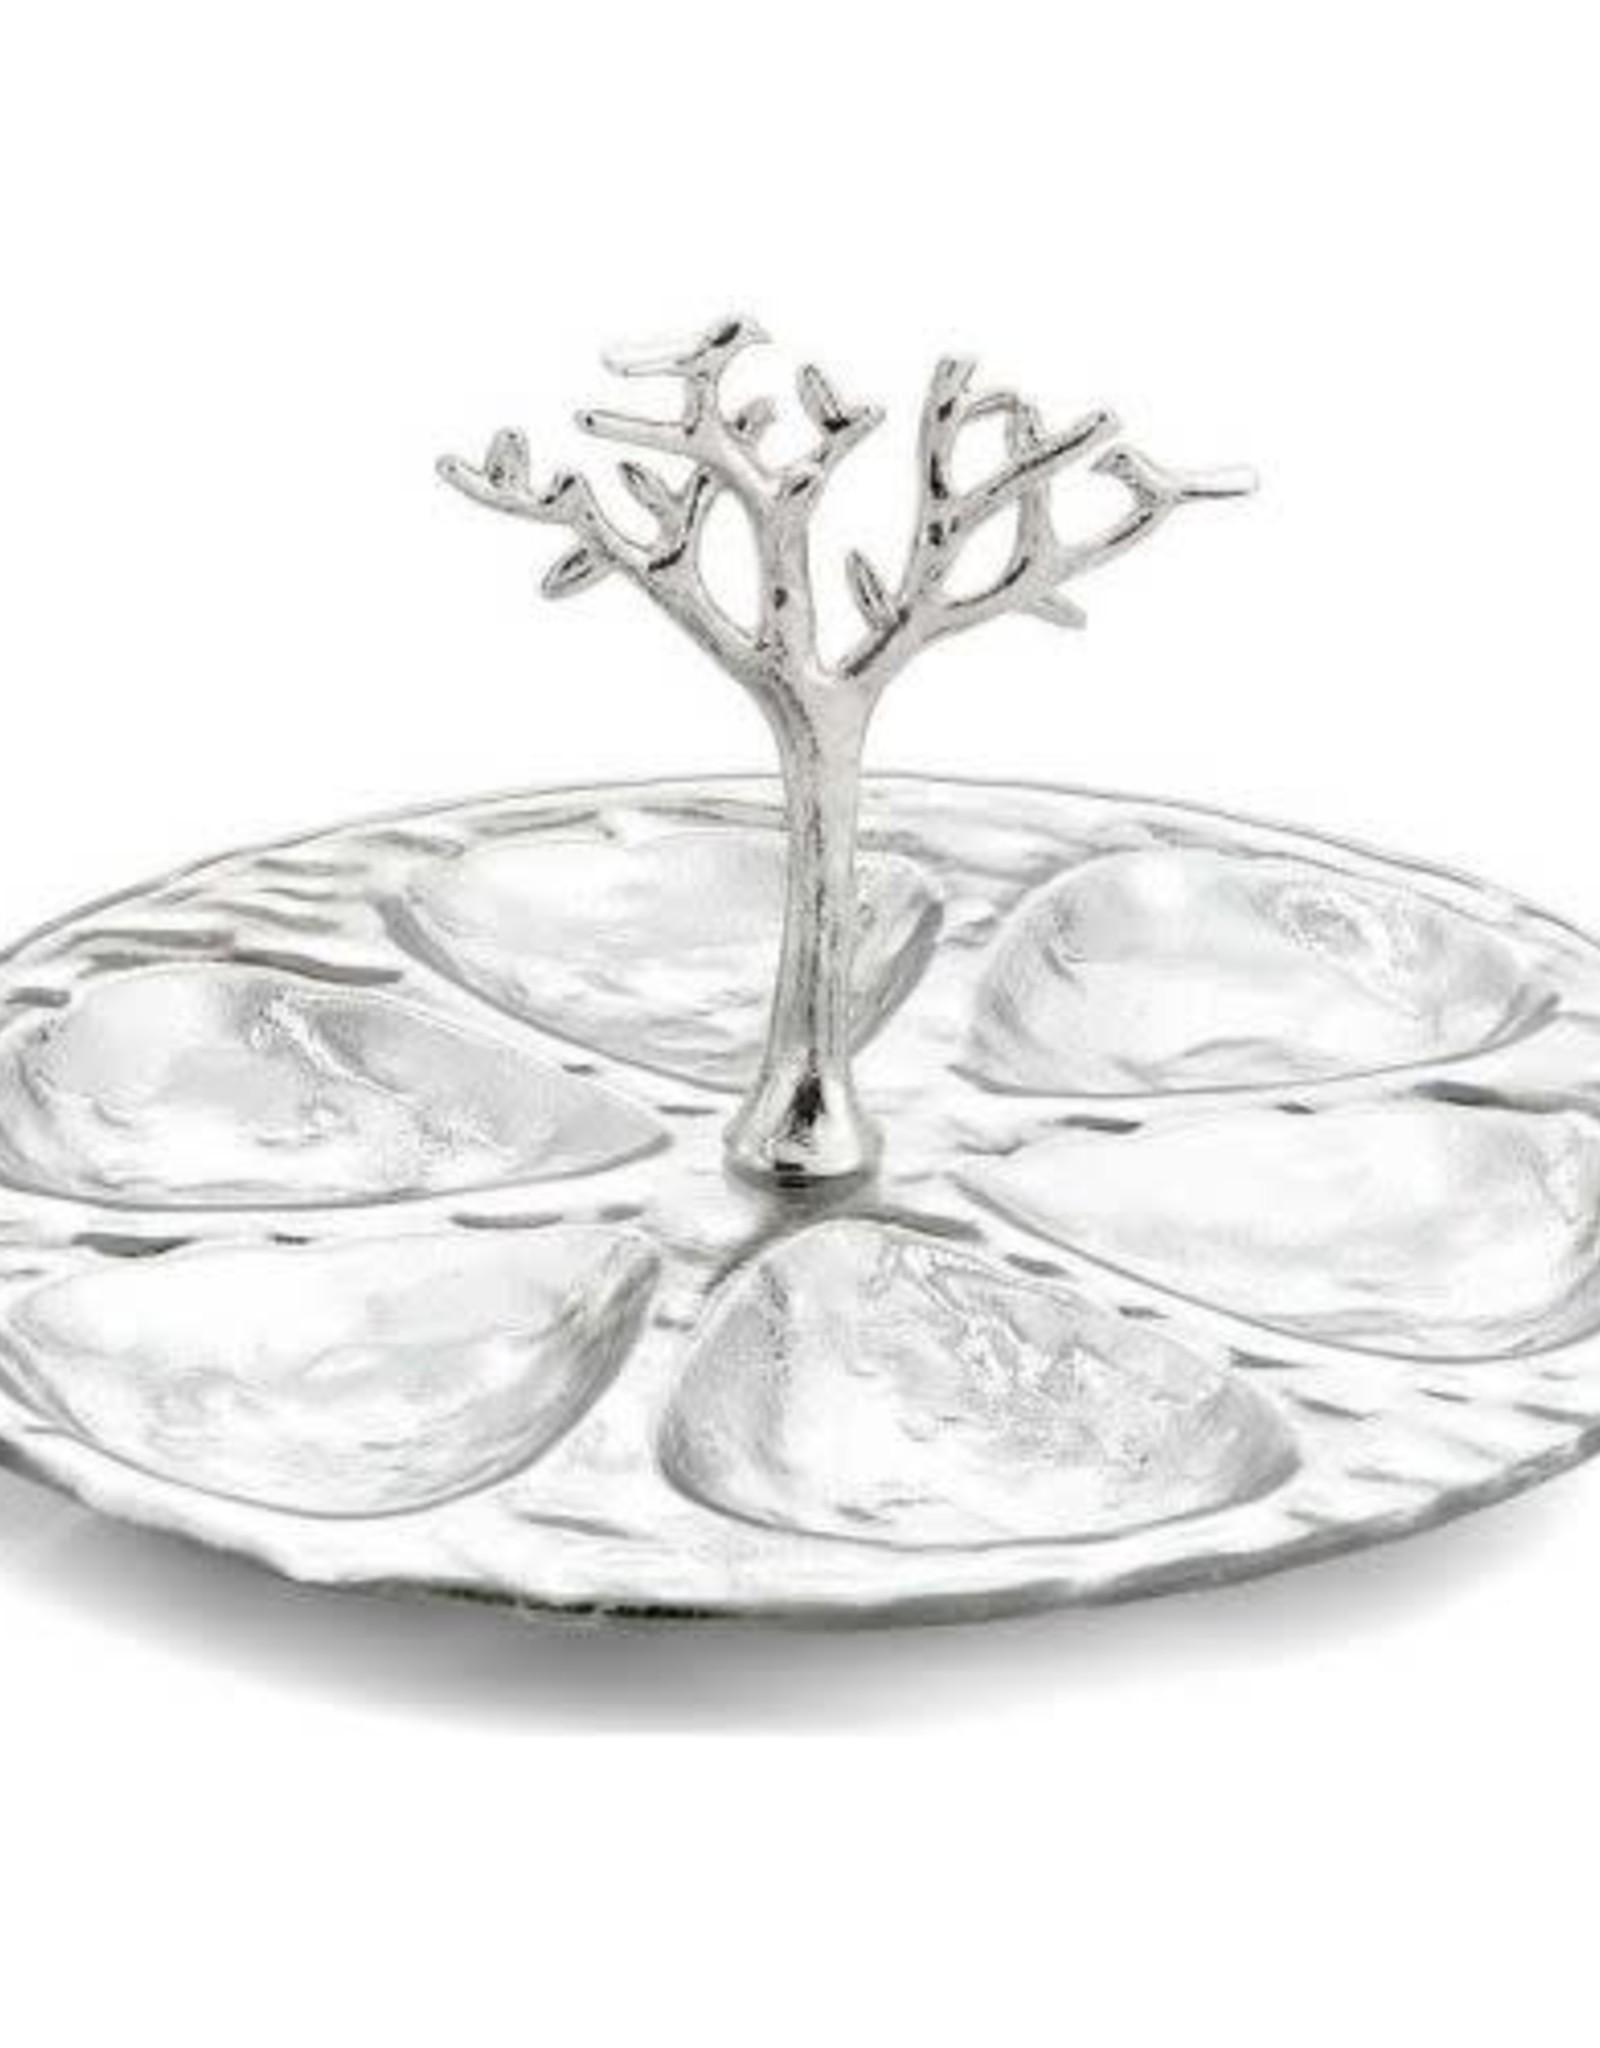 Seder plate, Tree of Life, Michael Aram